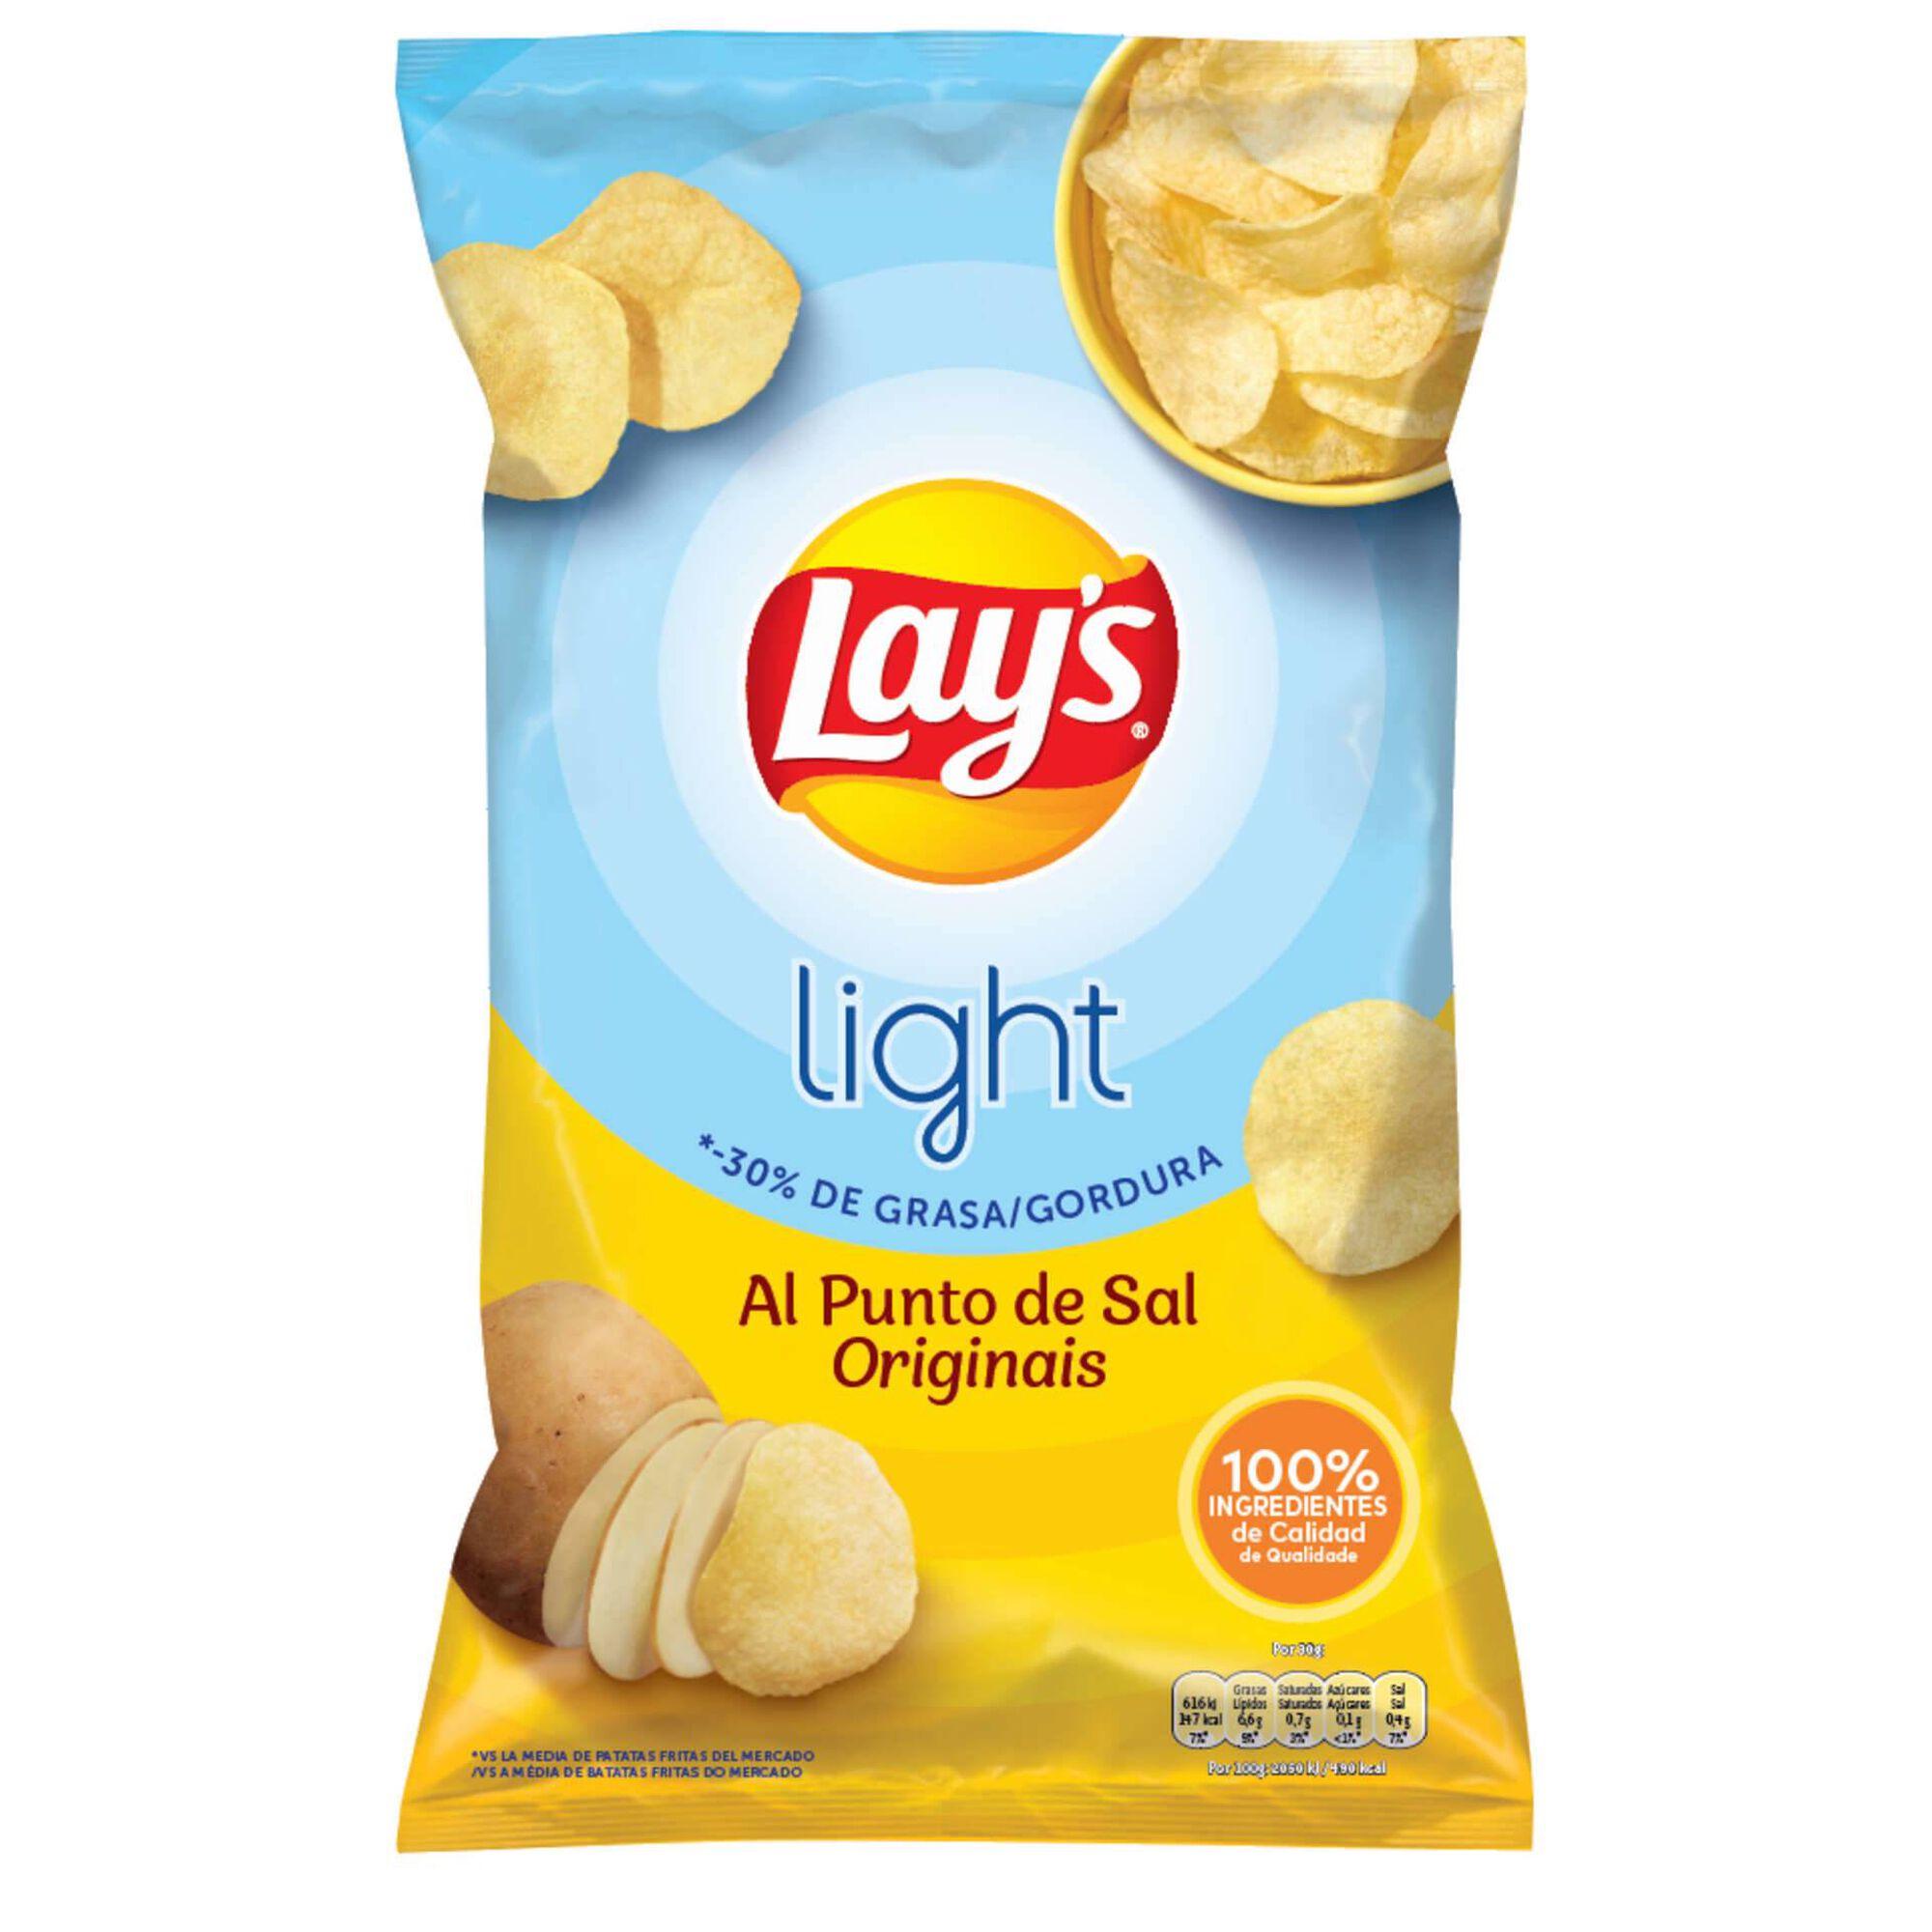 Batata Frita Lisa Light Original